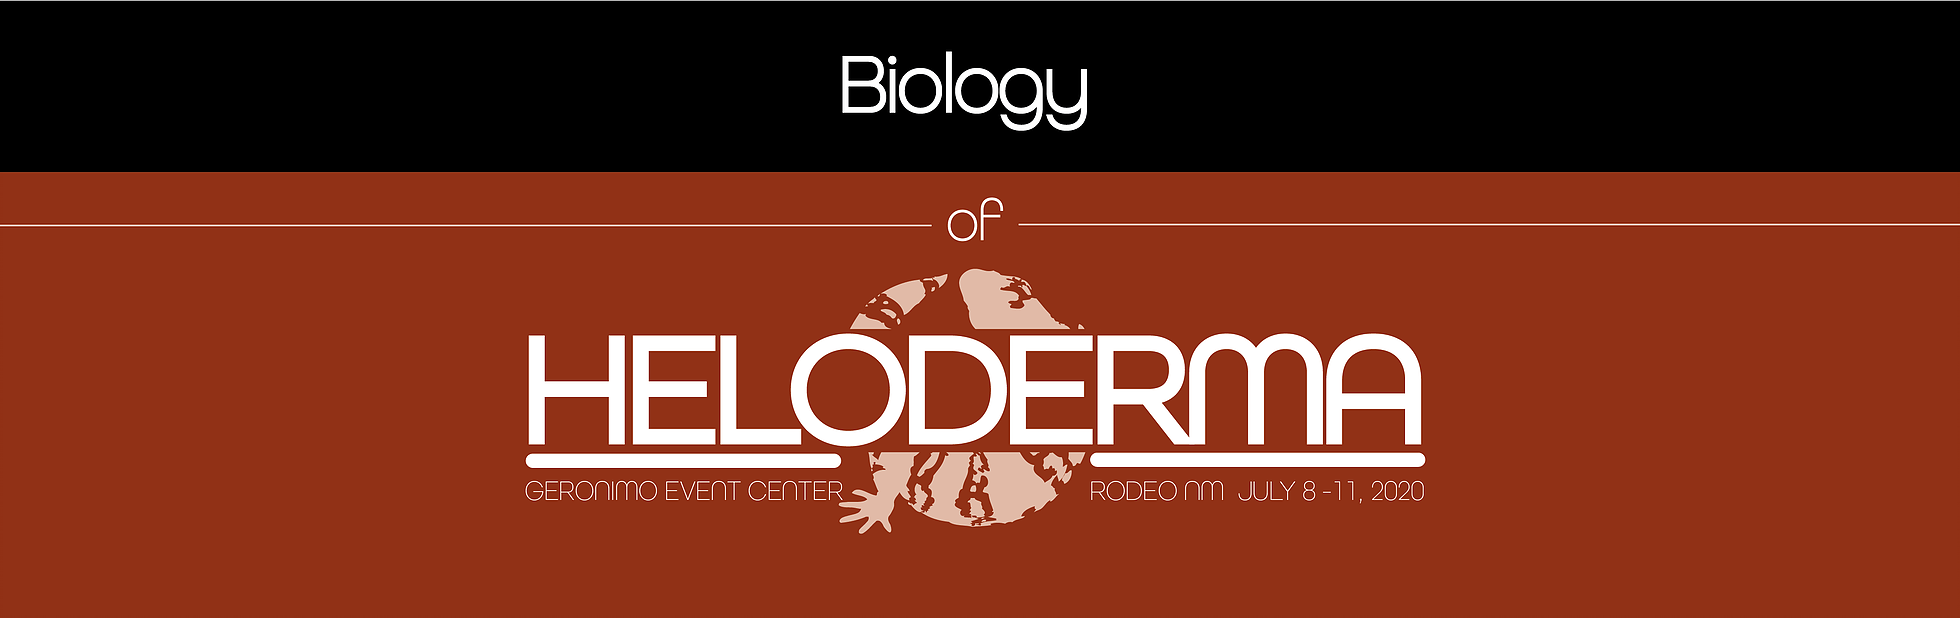 Biology of Heloderma Symposium July 8 - 11, 2020